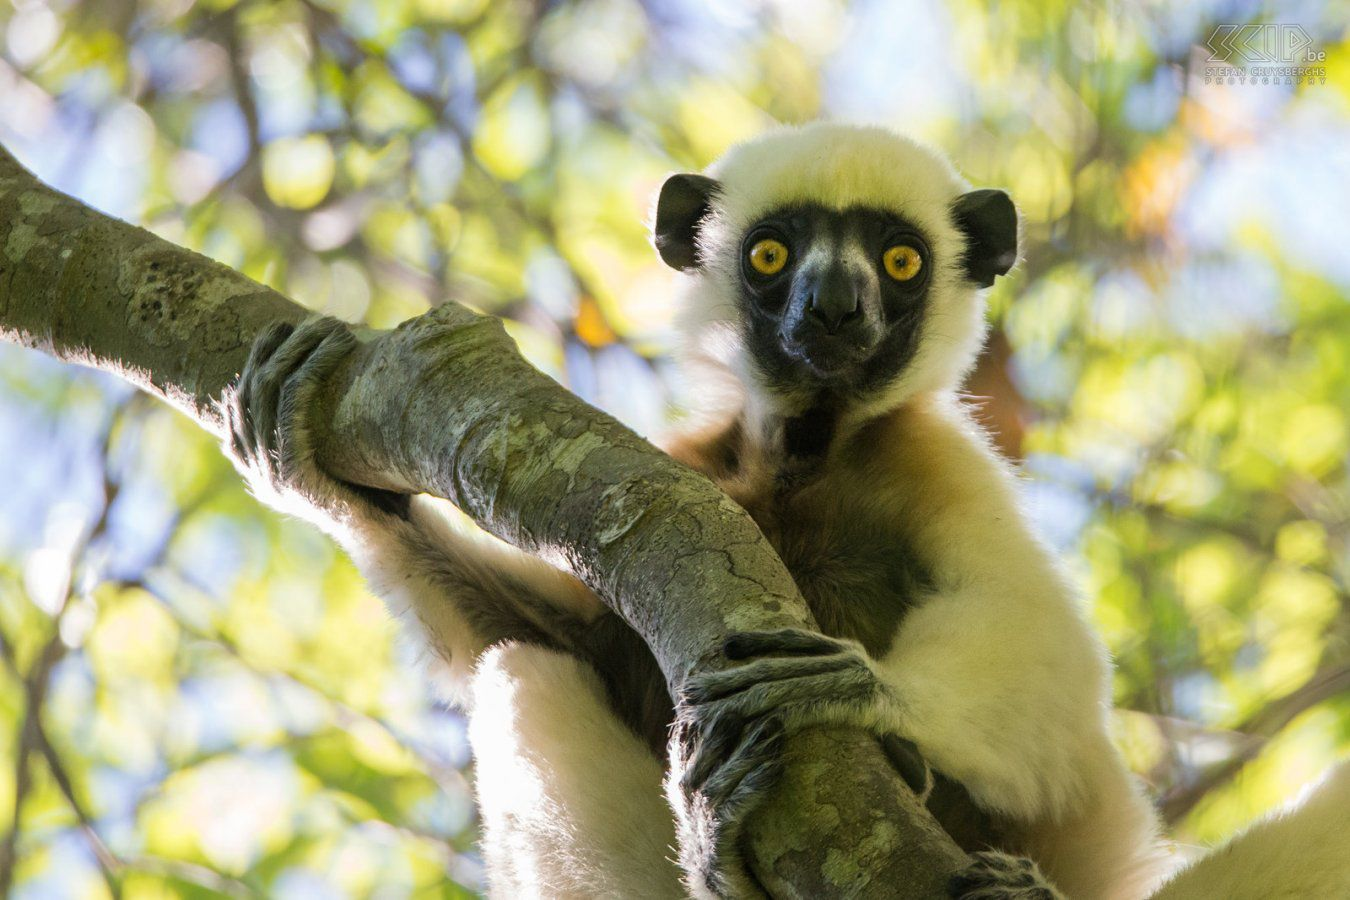 0699 - Madagascar - Tsingy groot - Decken's sifaka.jpg